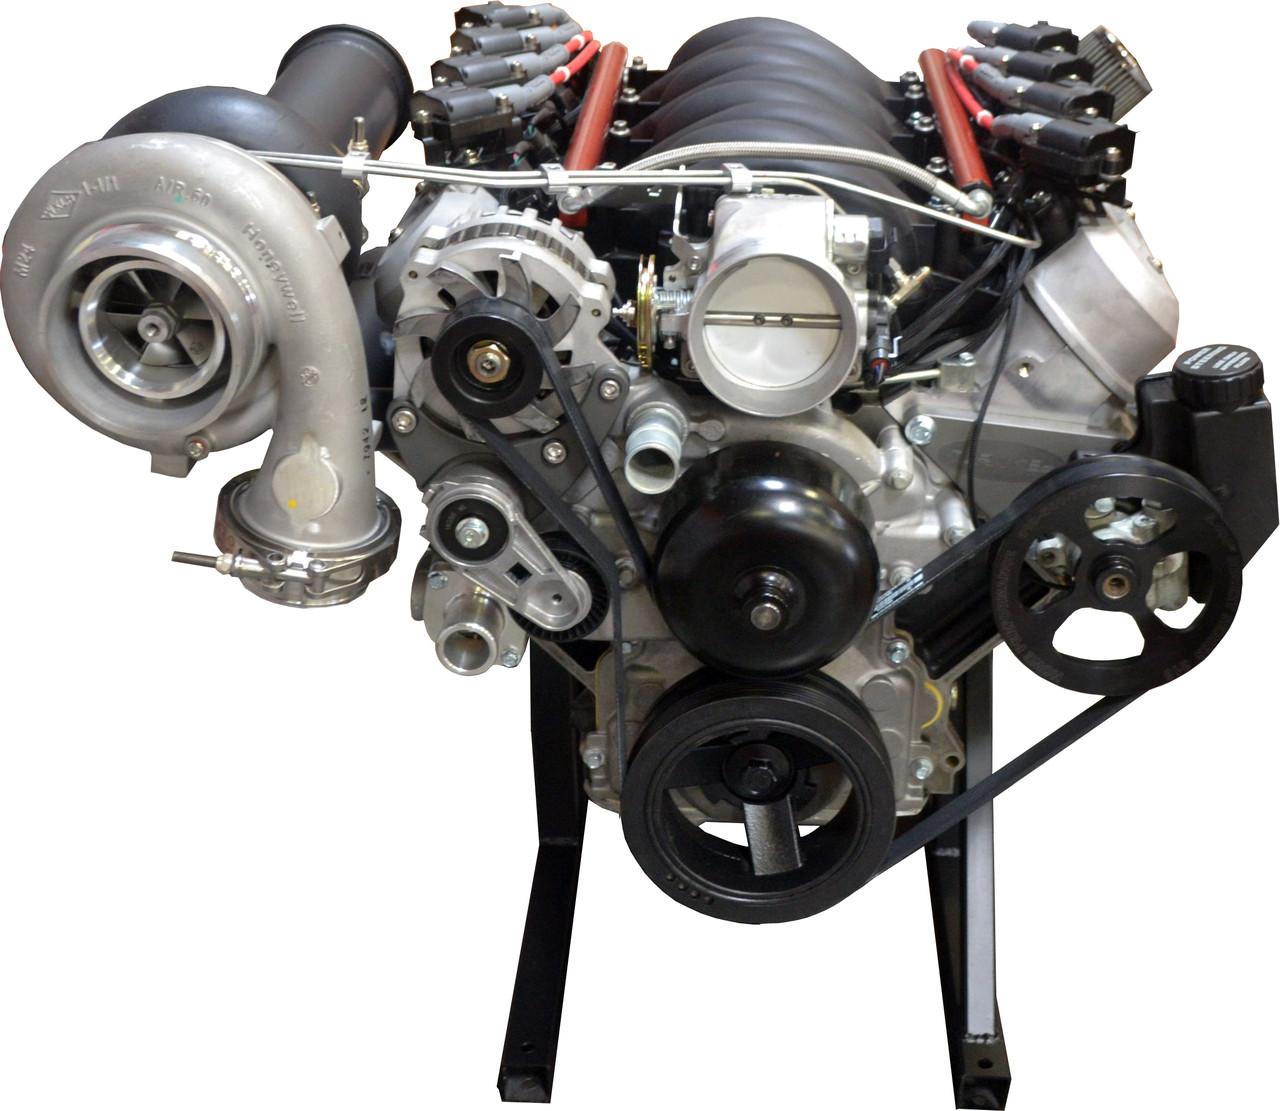 Turn Key Engine LSX 415 C I Turbo 850 HP Engine Assembly - Street